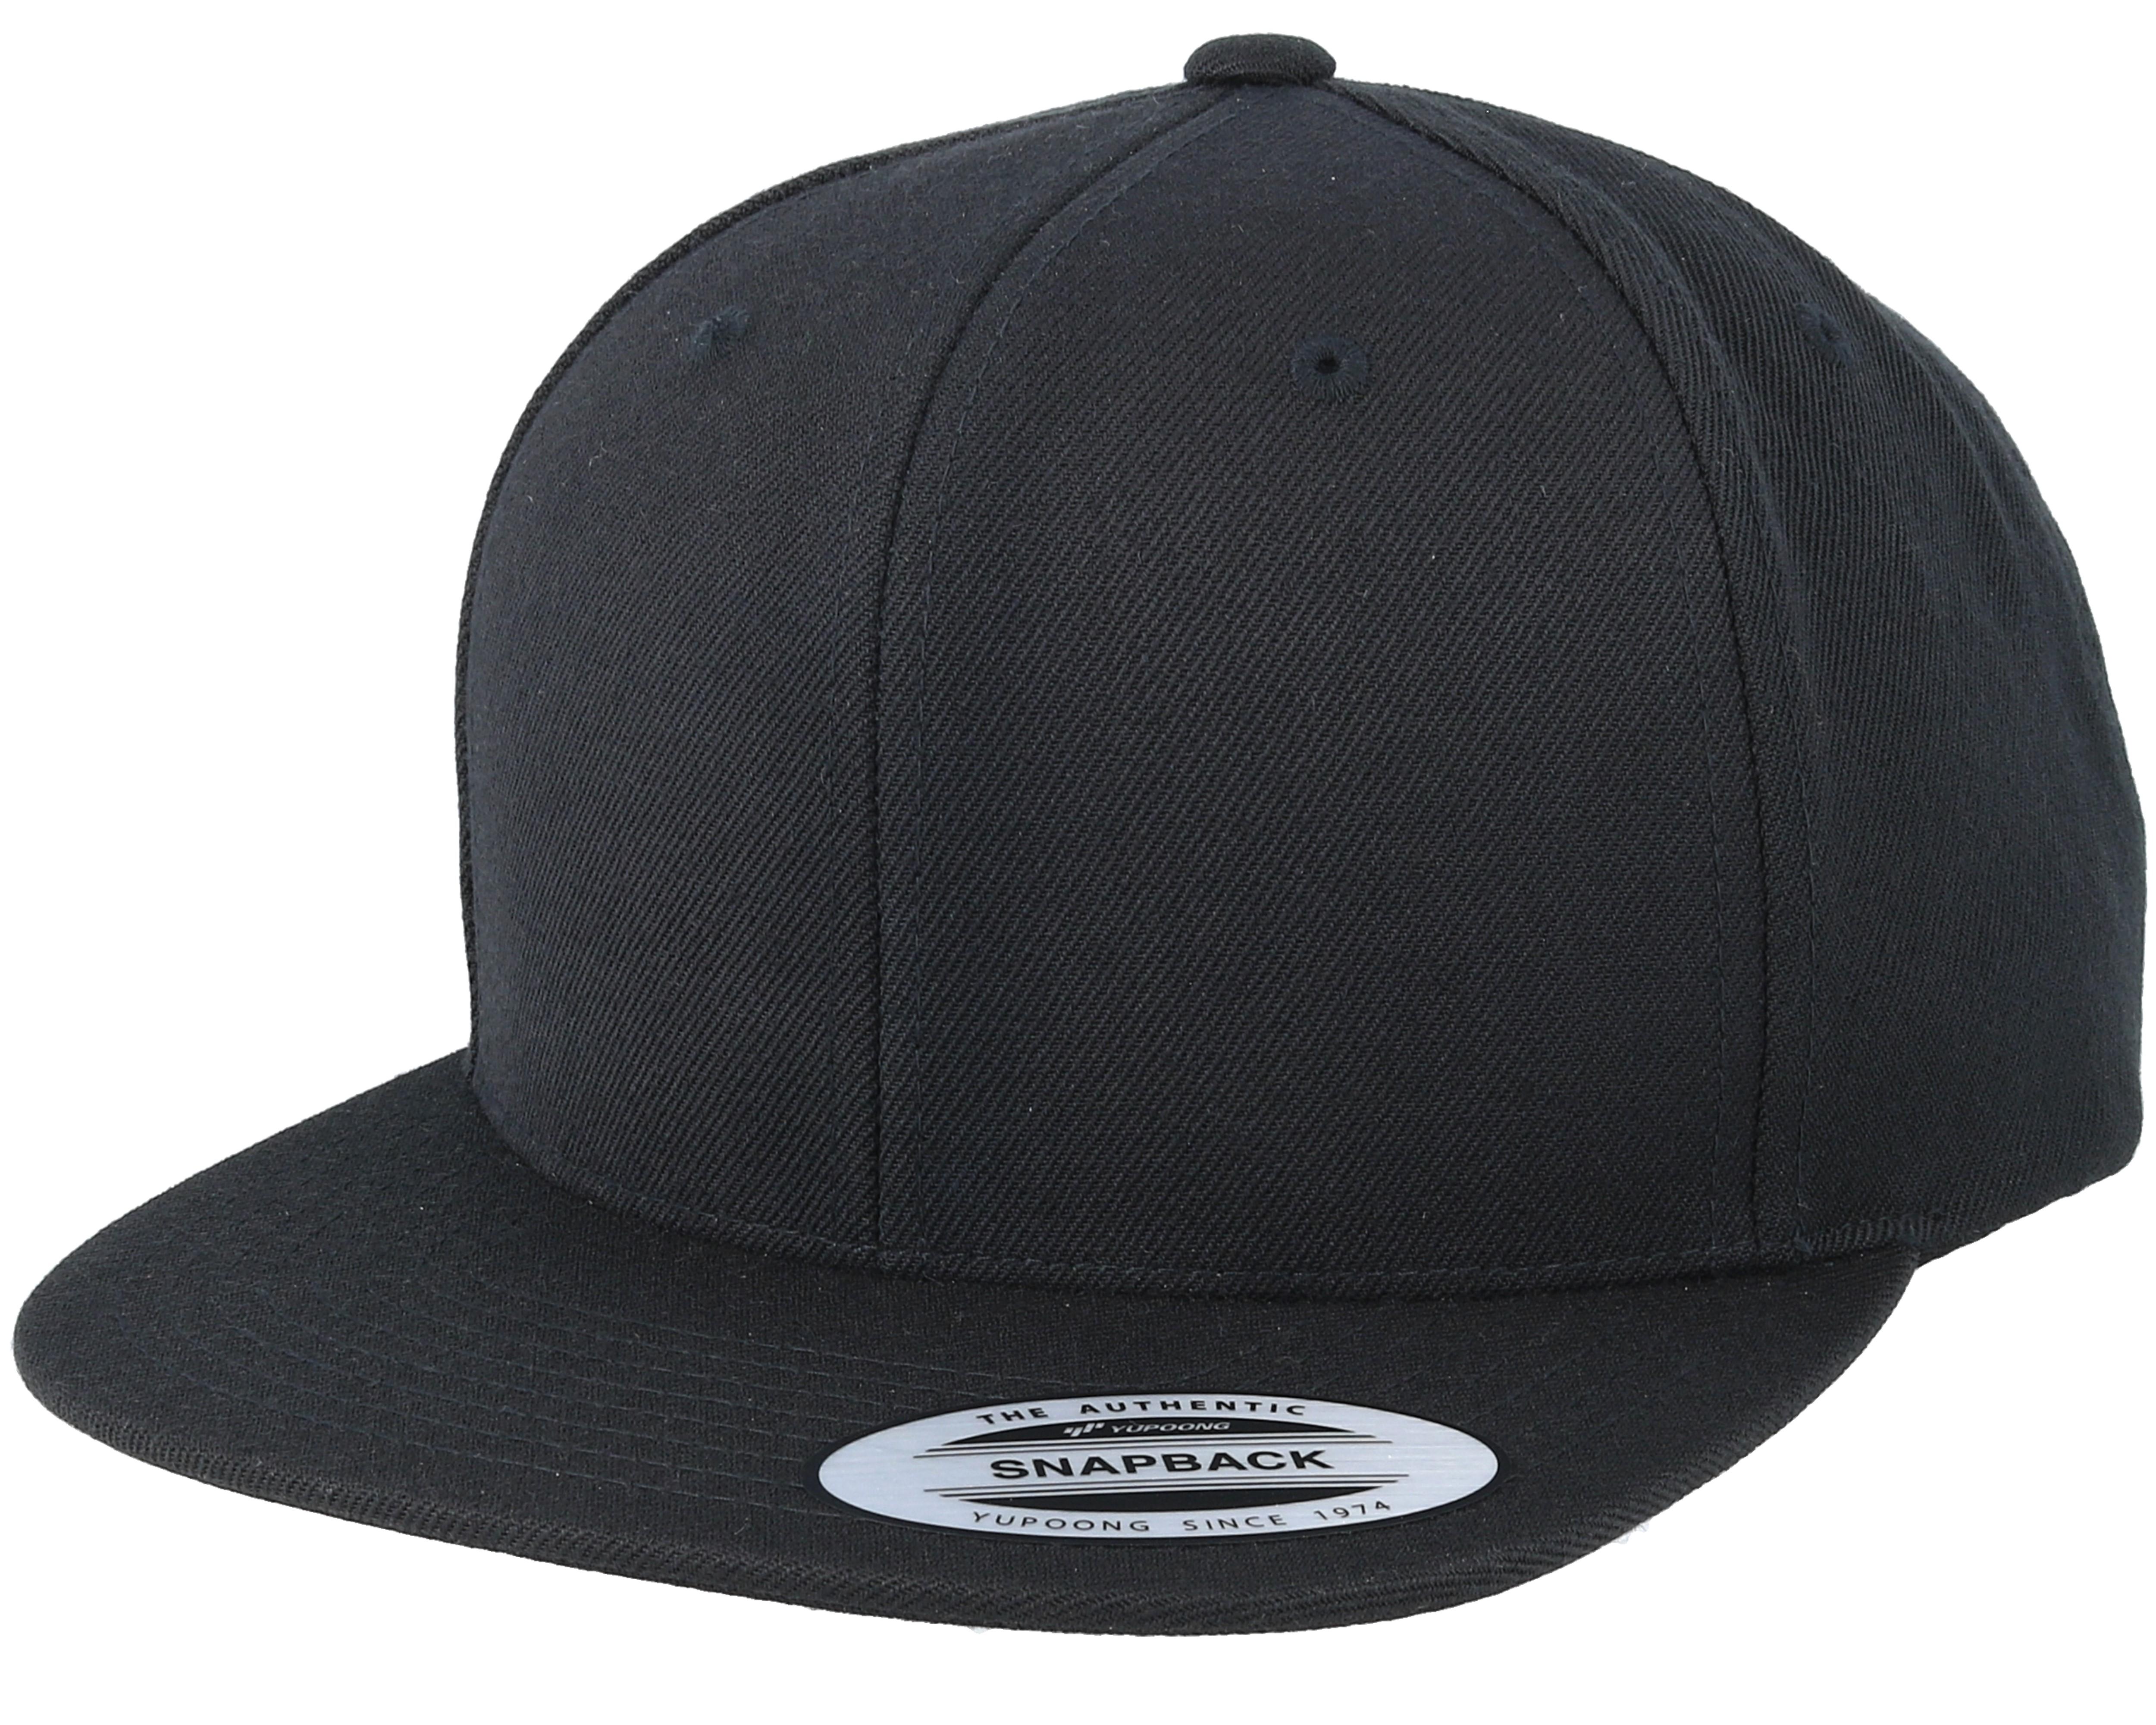 Black/Black Snapback - Yupoong caps | Hatstore.co.uk